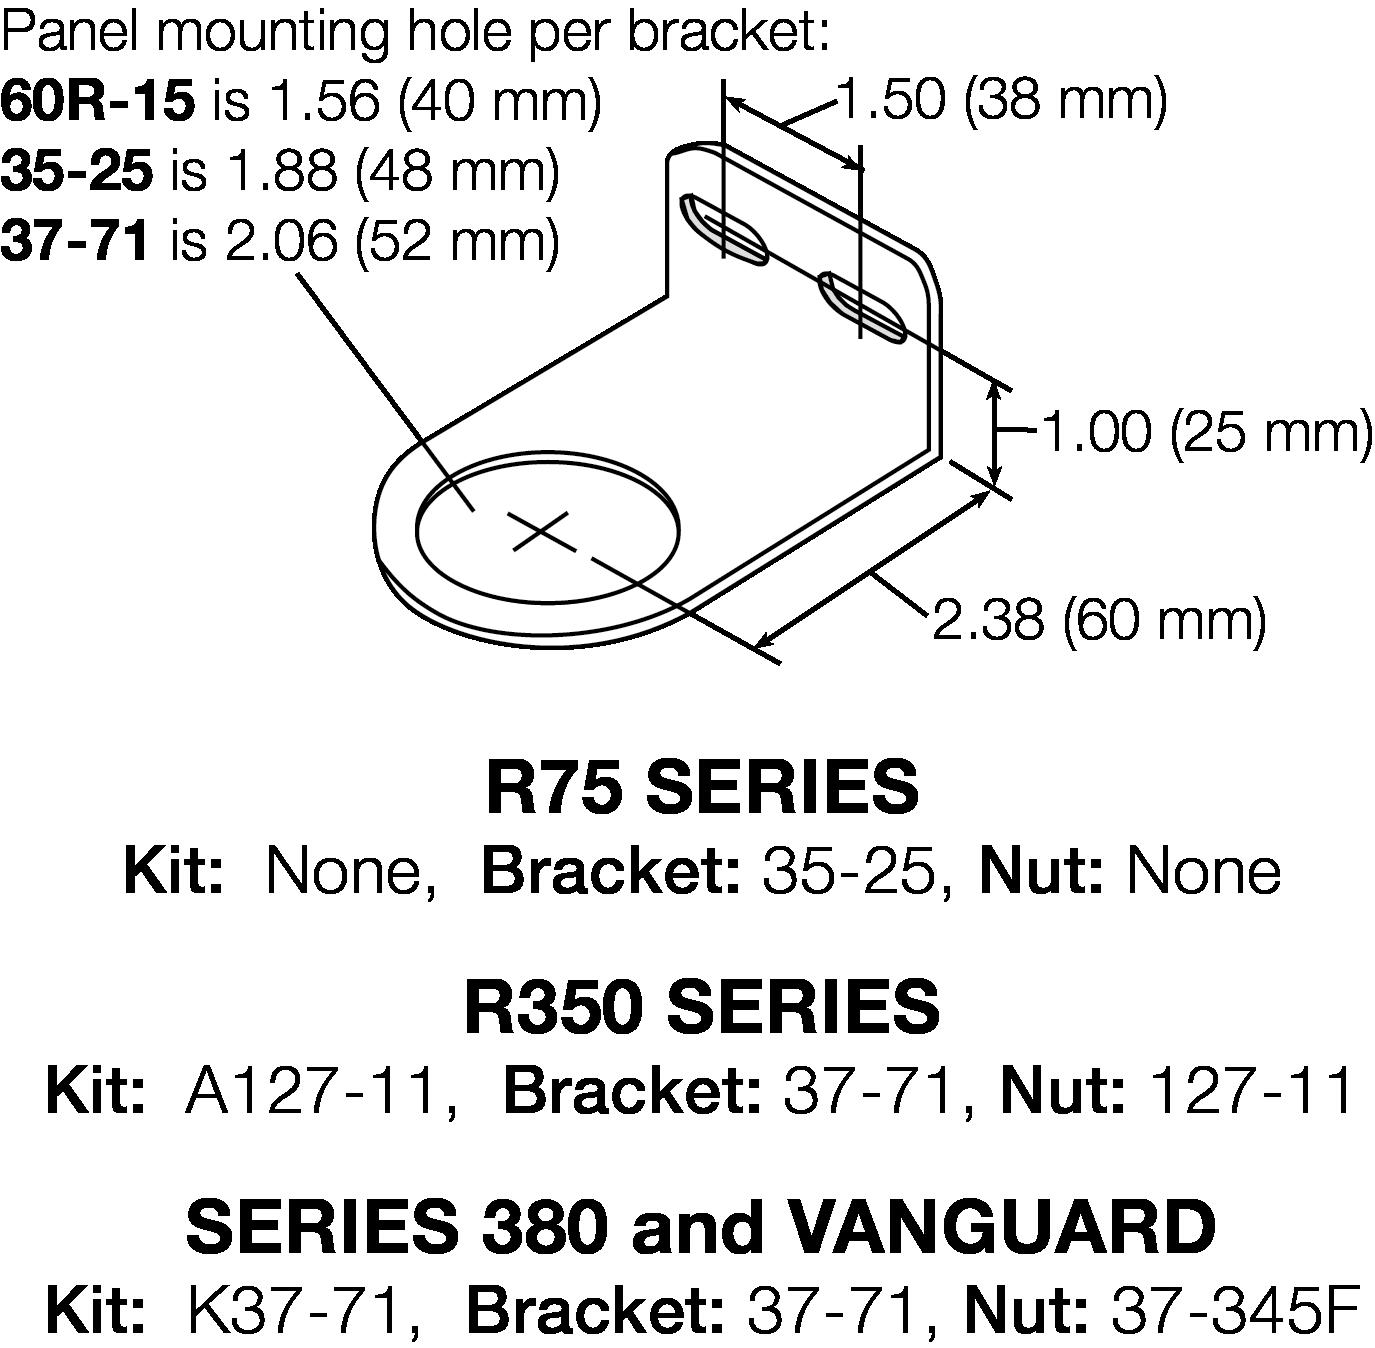 R75, R350, R380 AND VANGUARD BRACKET